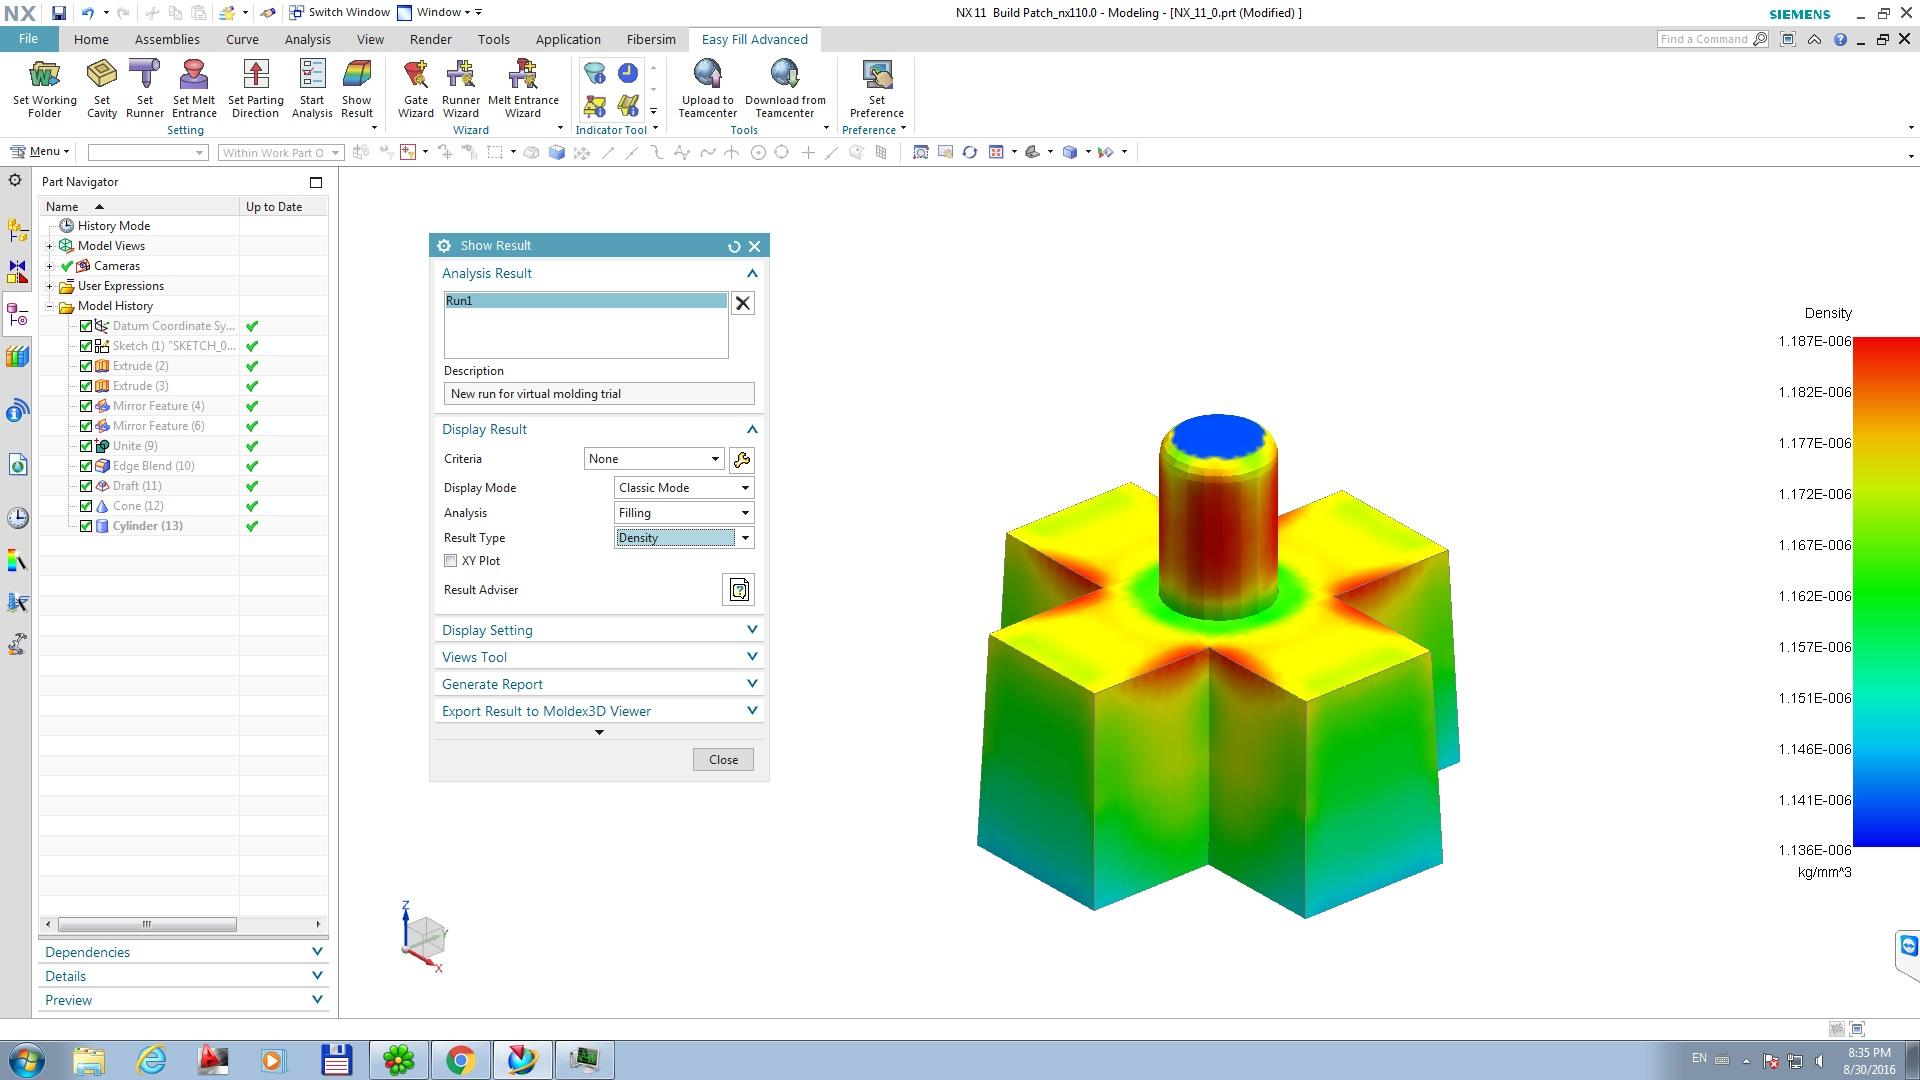 download Siemens NX 11.0 Easy Fill Advanced v1.20160727 Win64 full